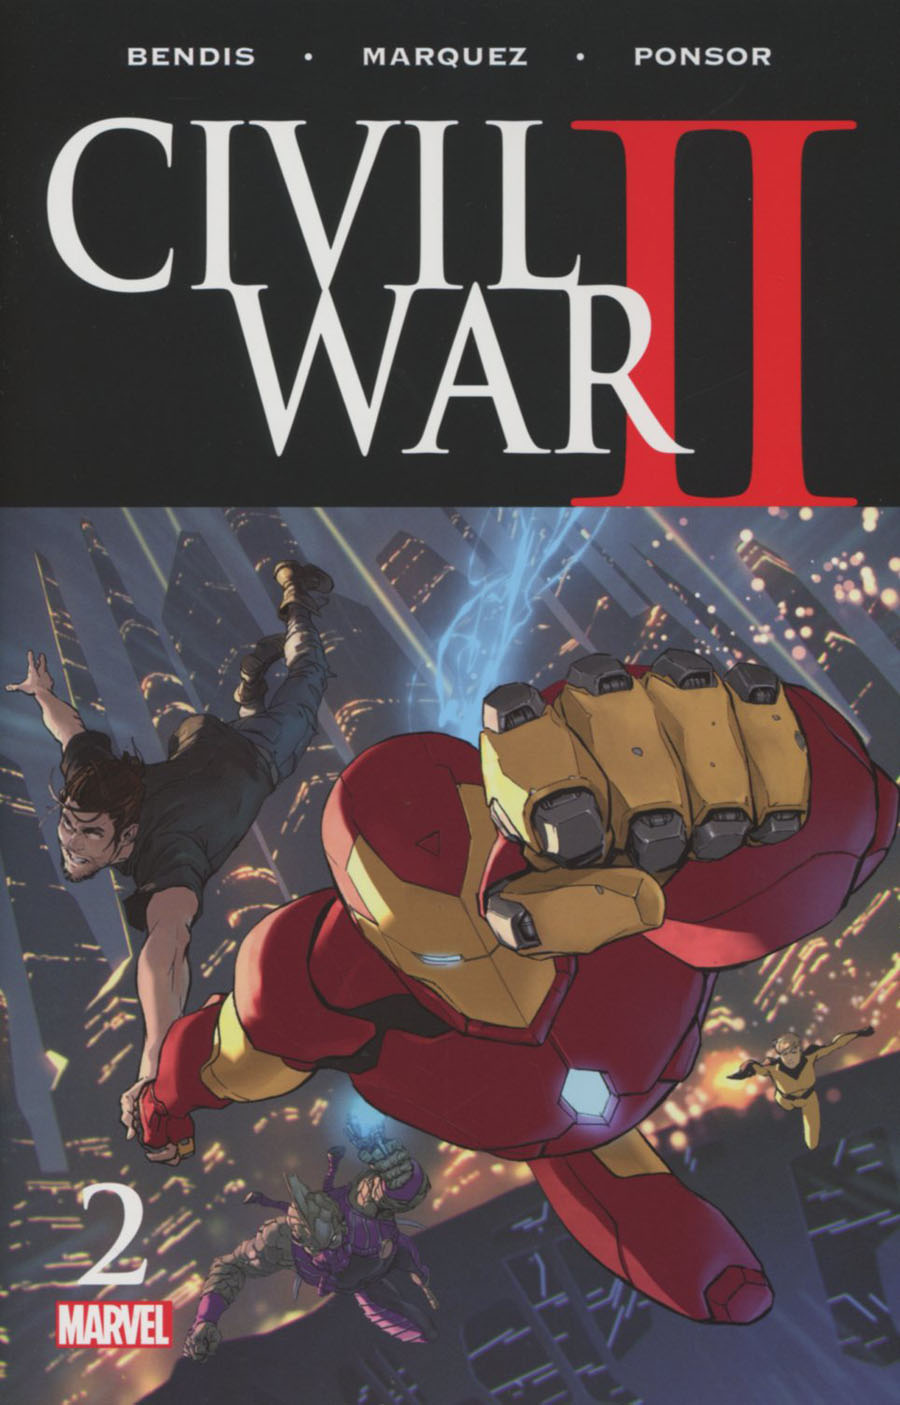 Civil War II #2 Cover A 1st Ptg Regular Marko Djurdjevic Cover